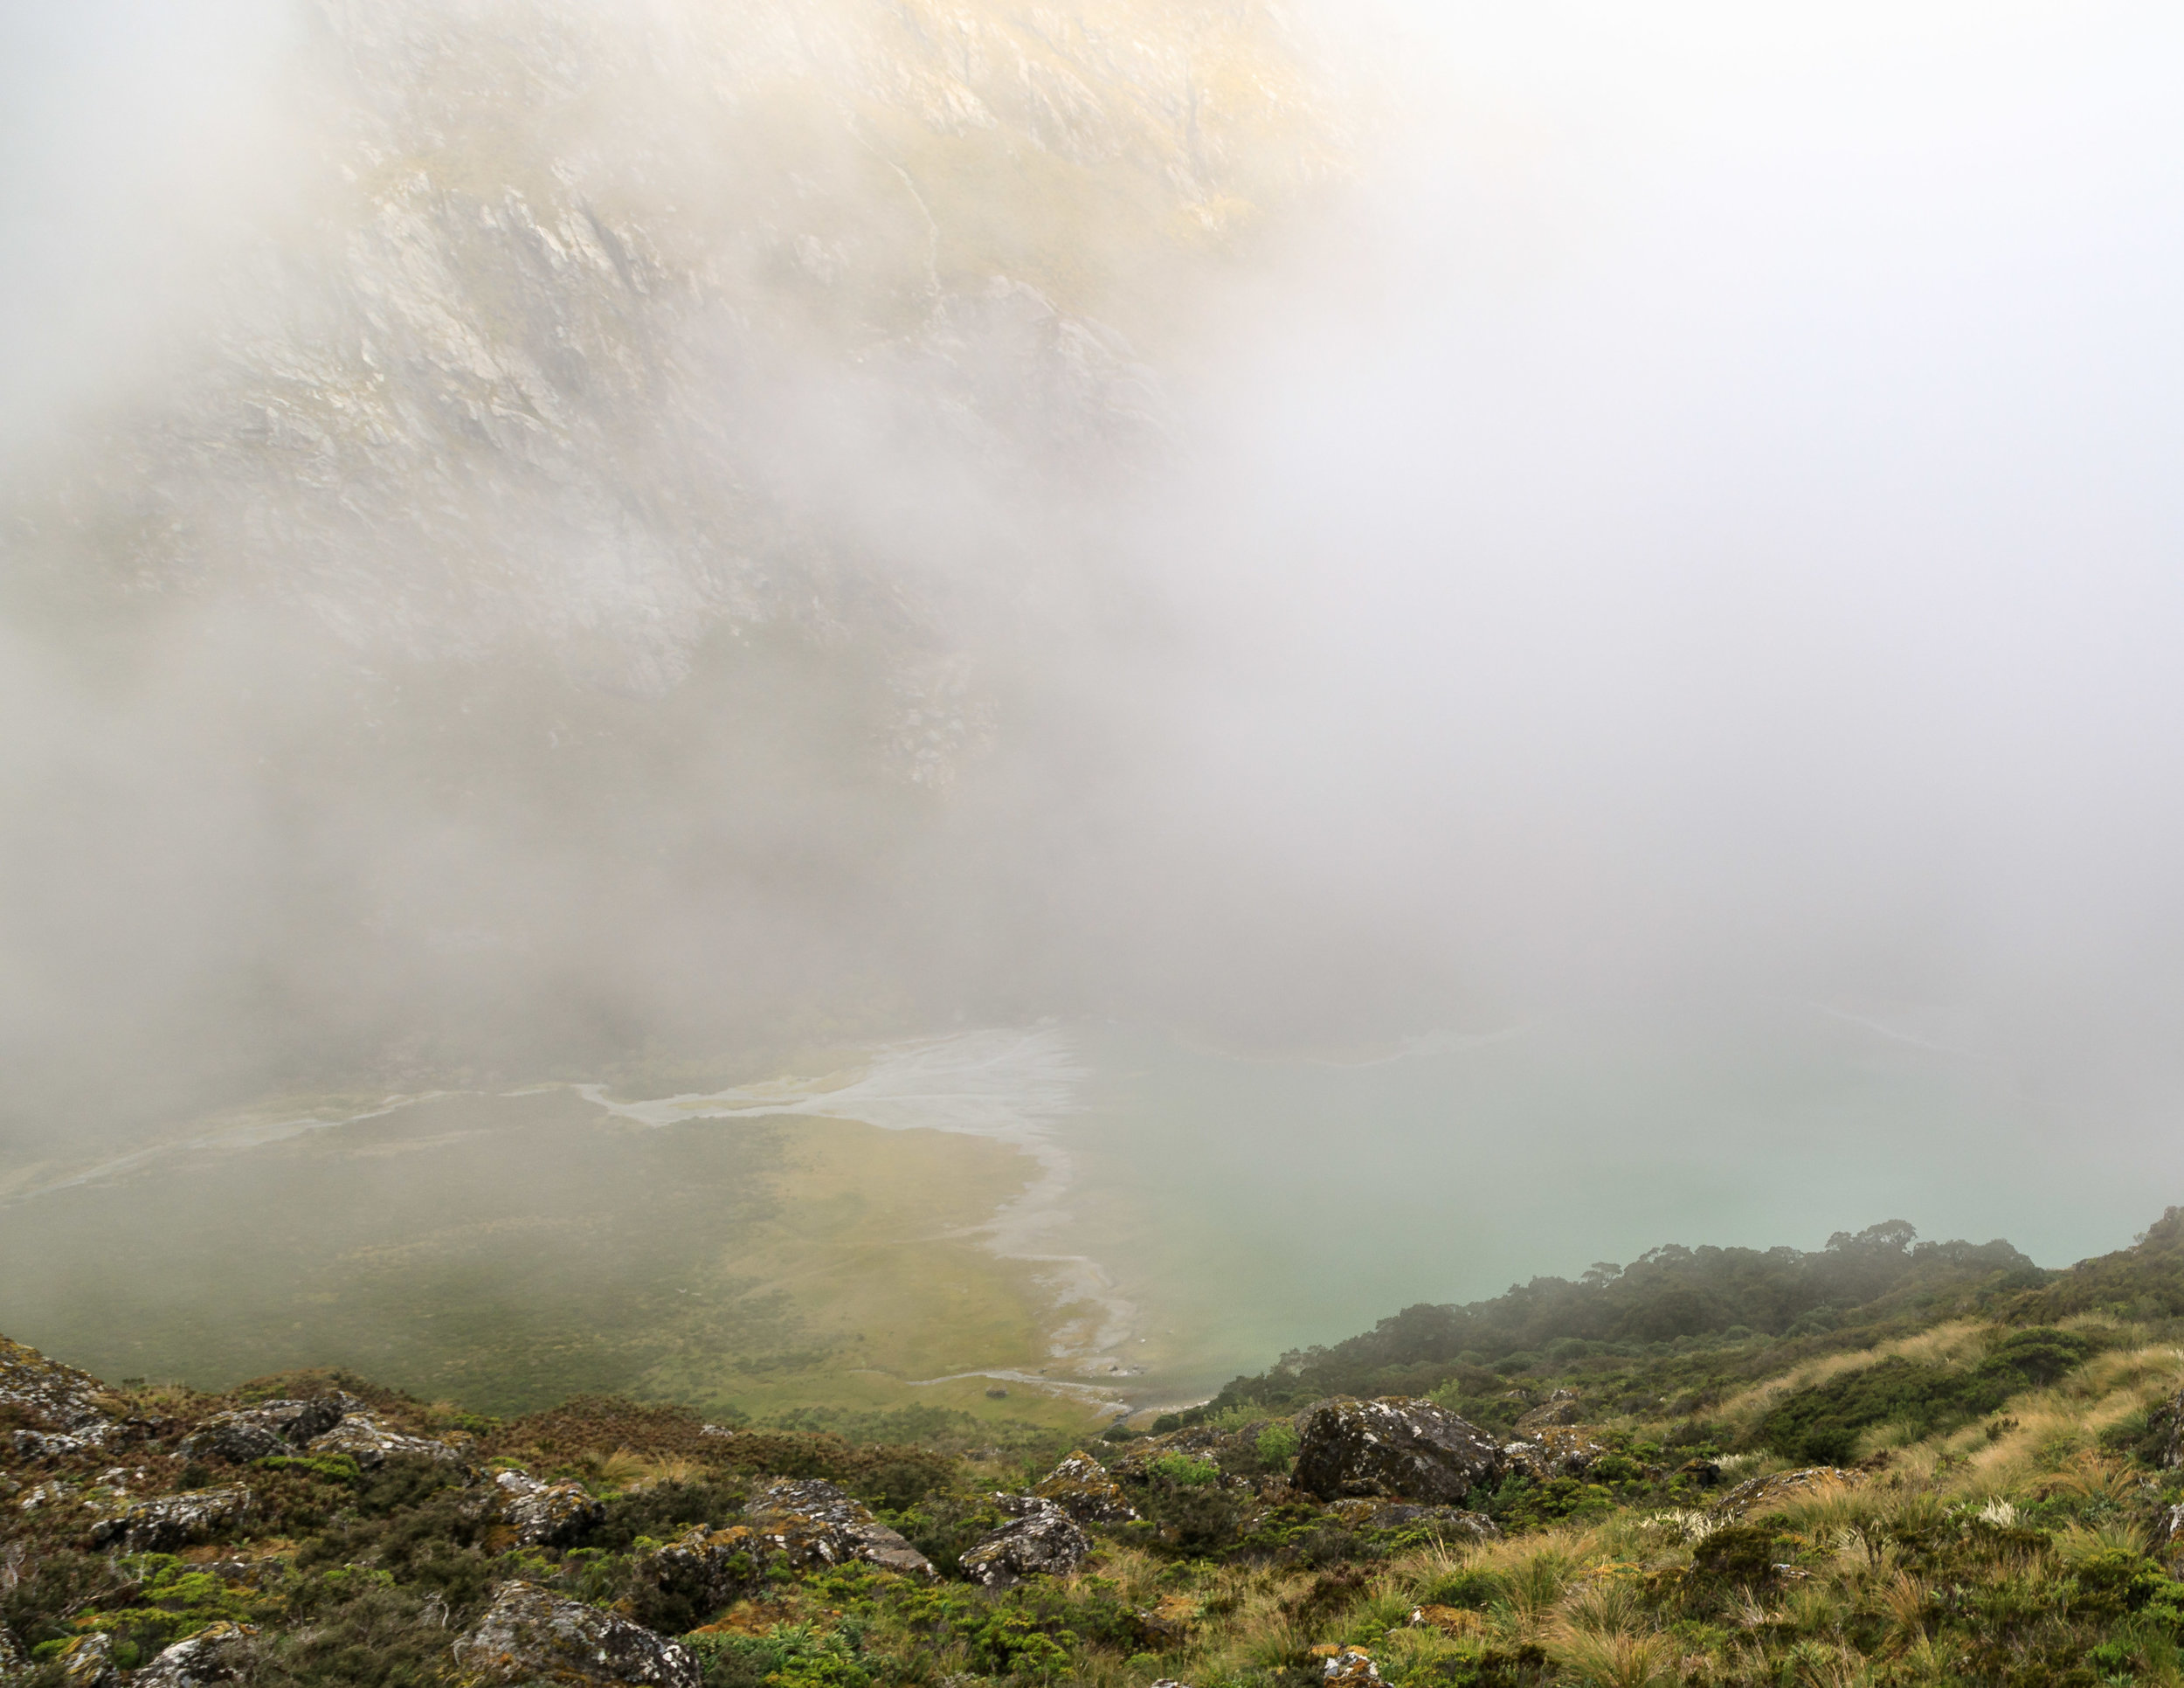 The Routeburn Track: Lake MacKenzie through the mist